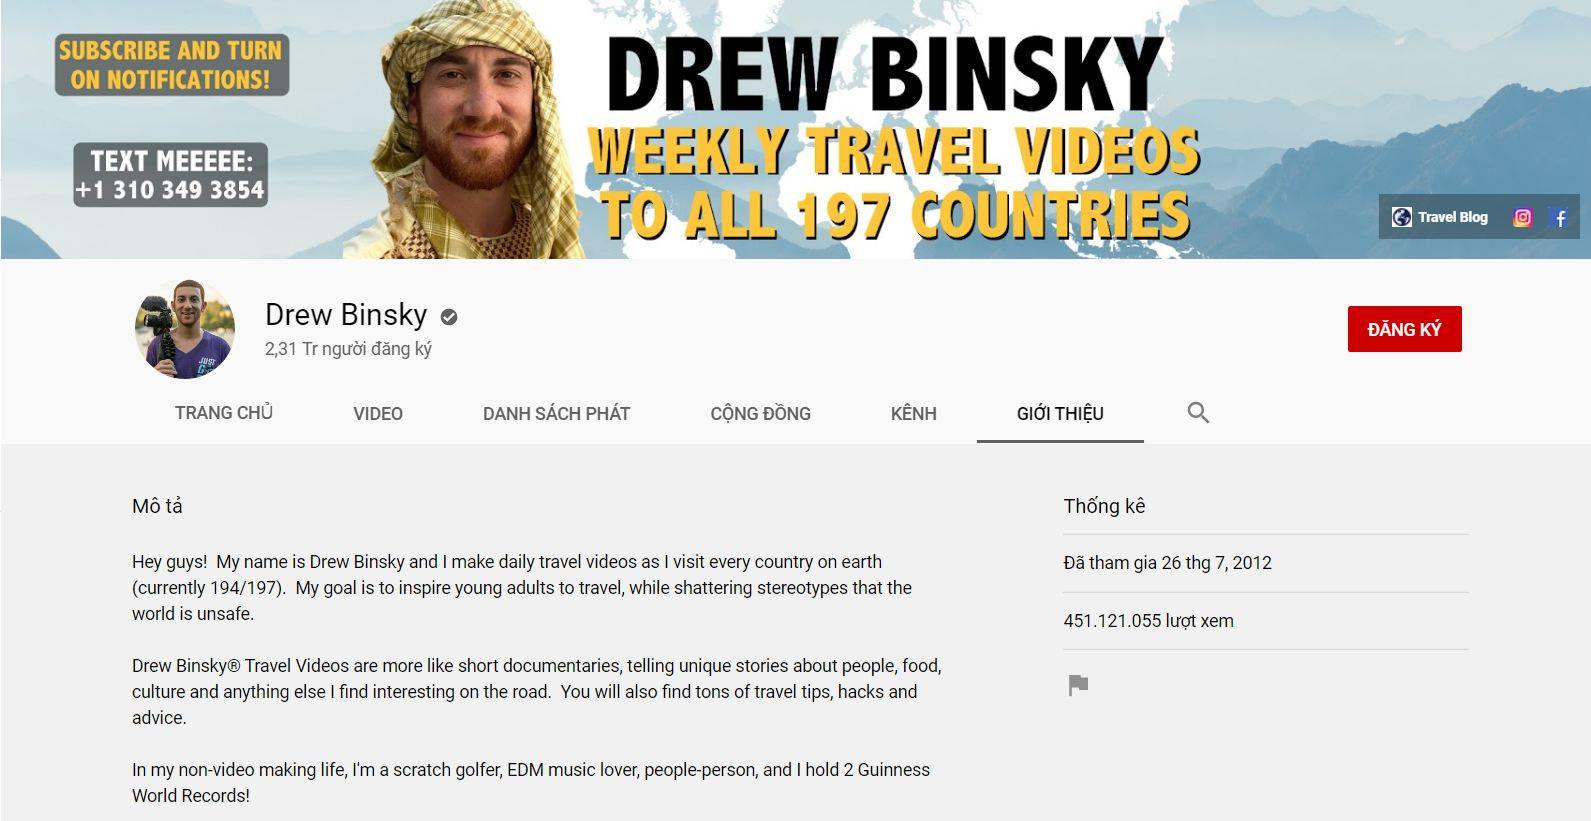 drew binsky - travel blogger nổi tiếng thế giới